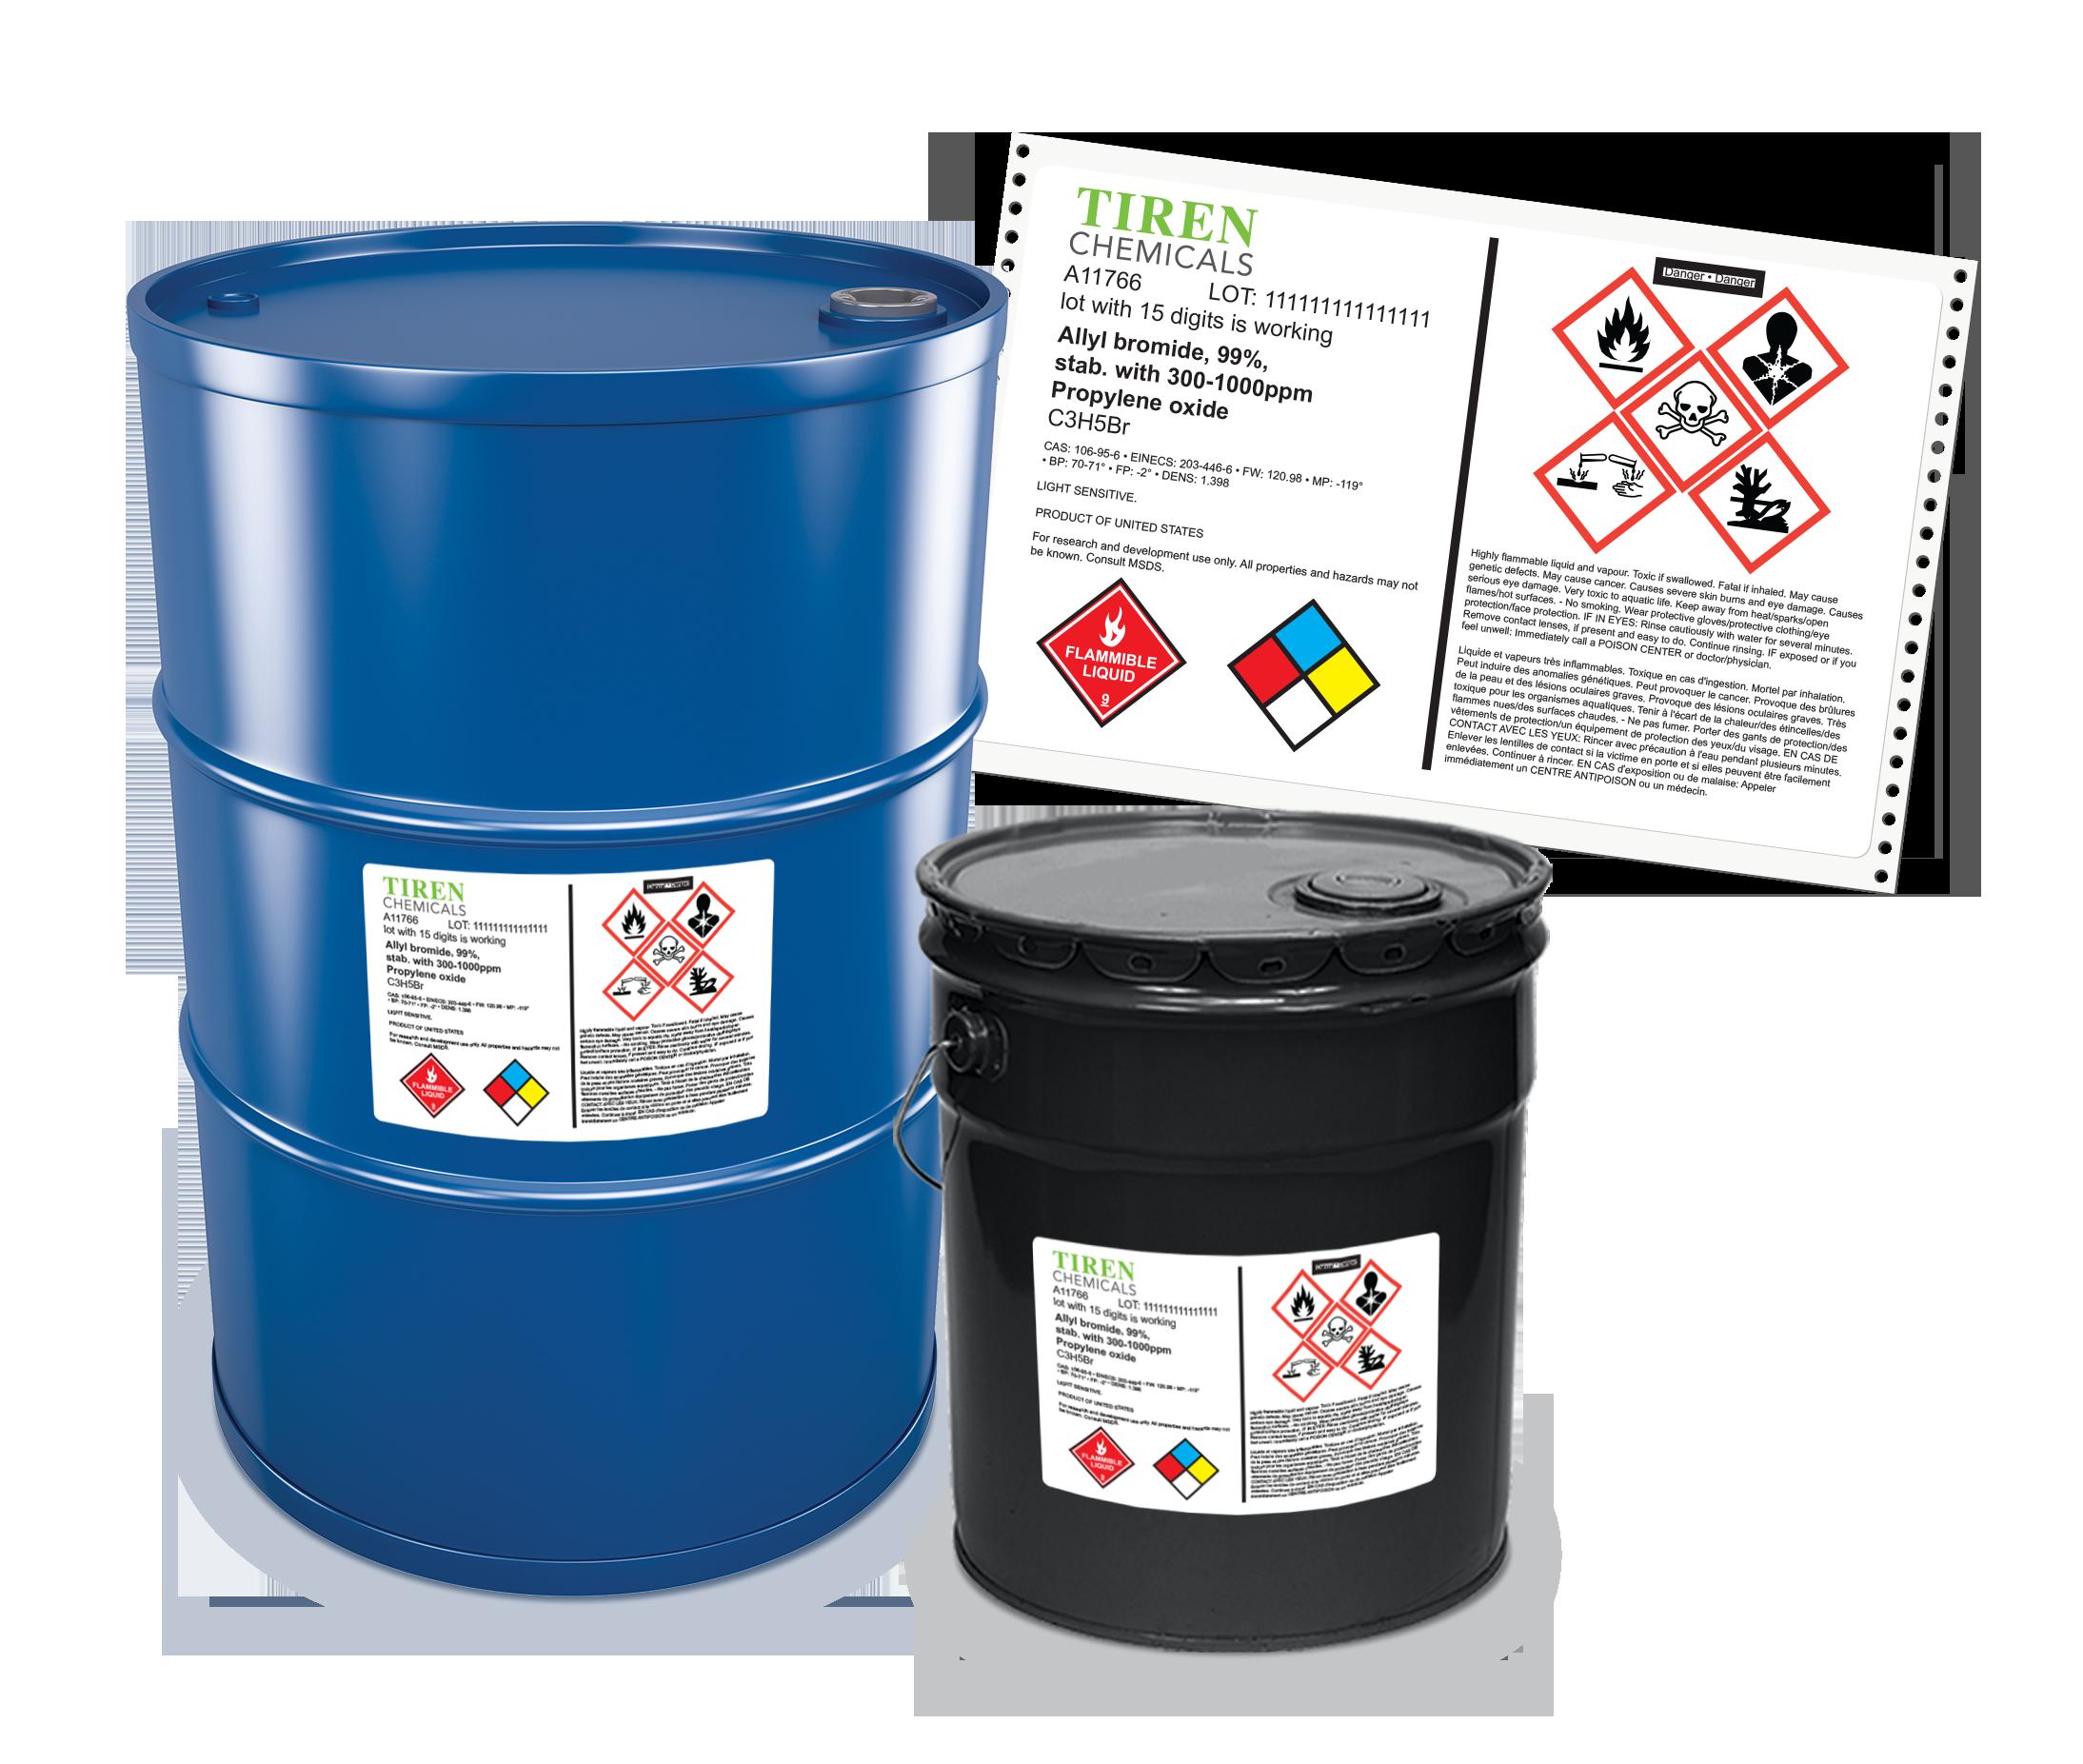 GHSforchemicallabels